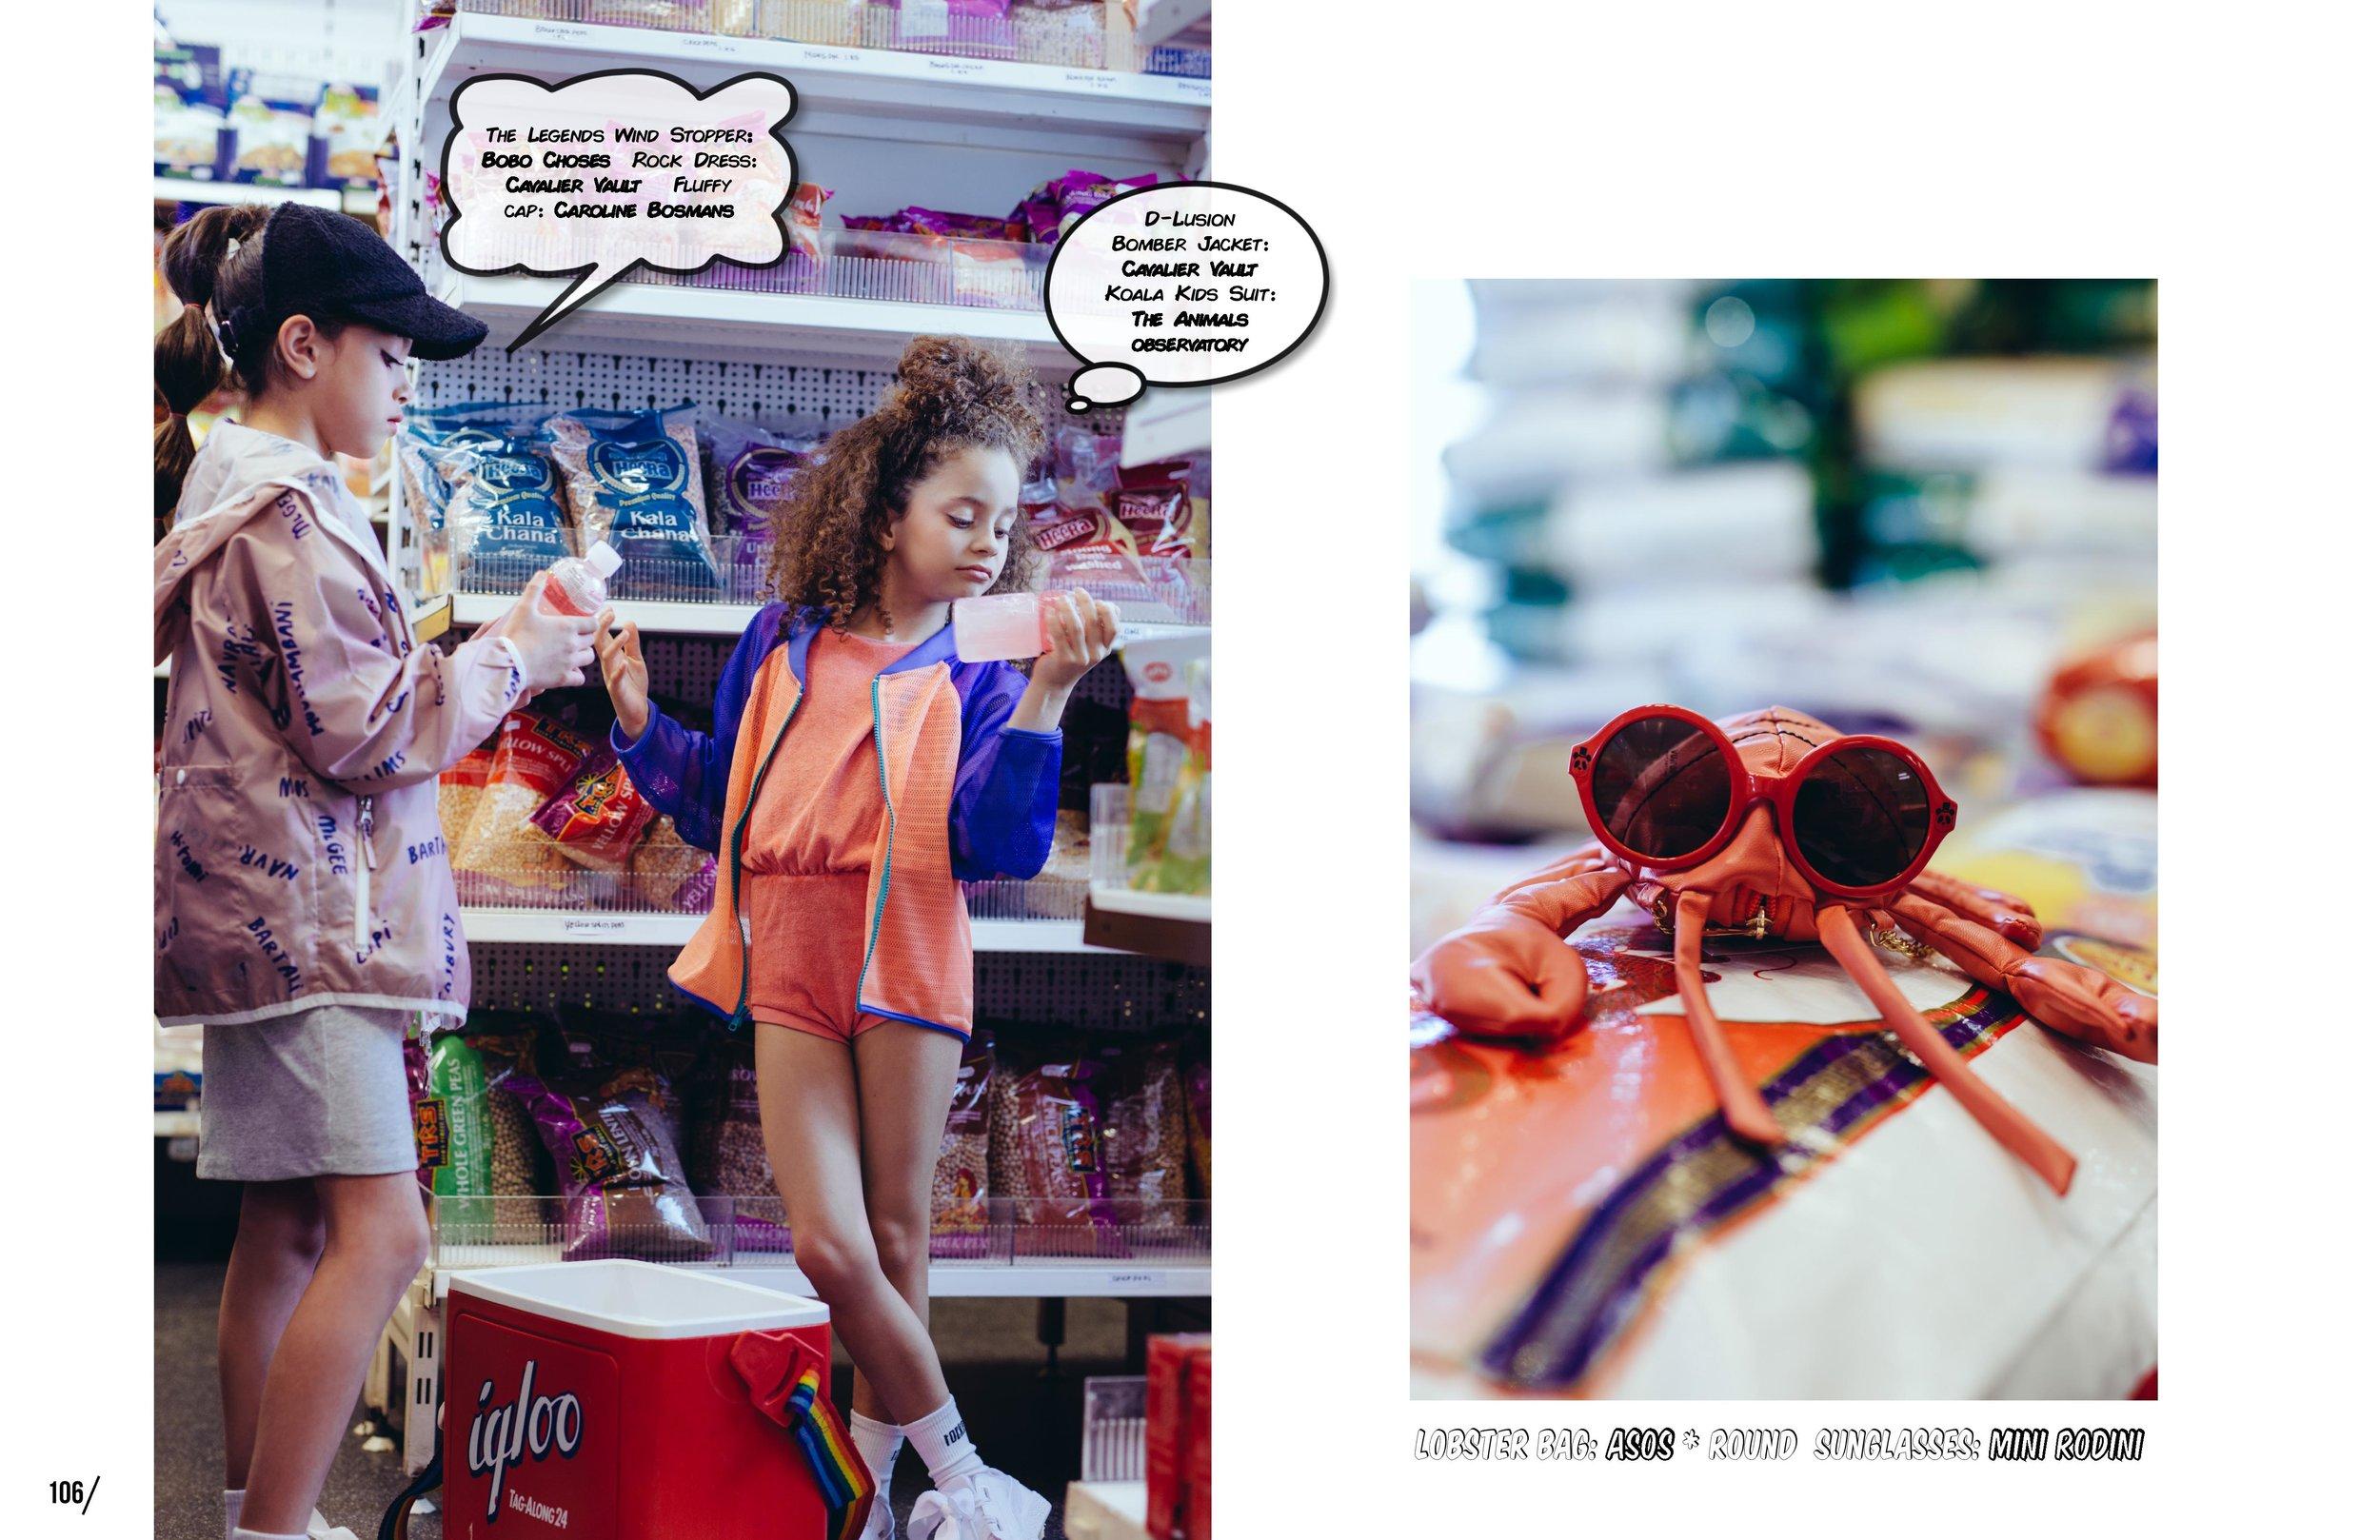 Summer2017-shoppingforlove-page-002.jpg